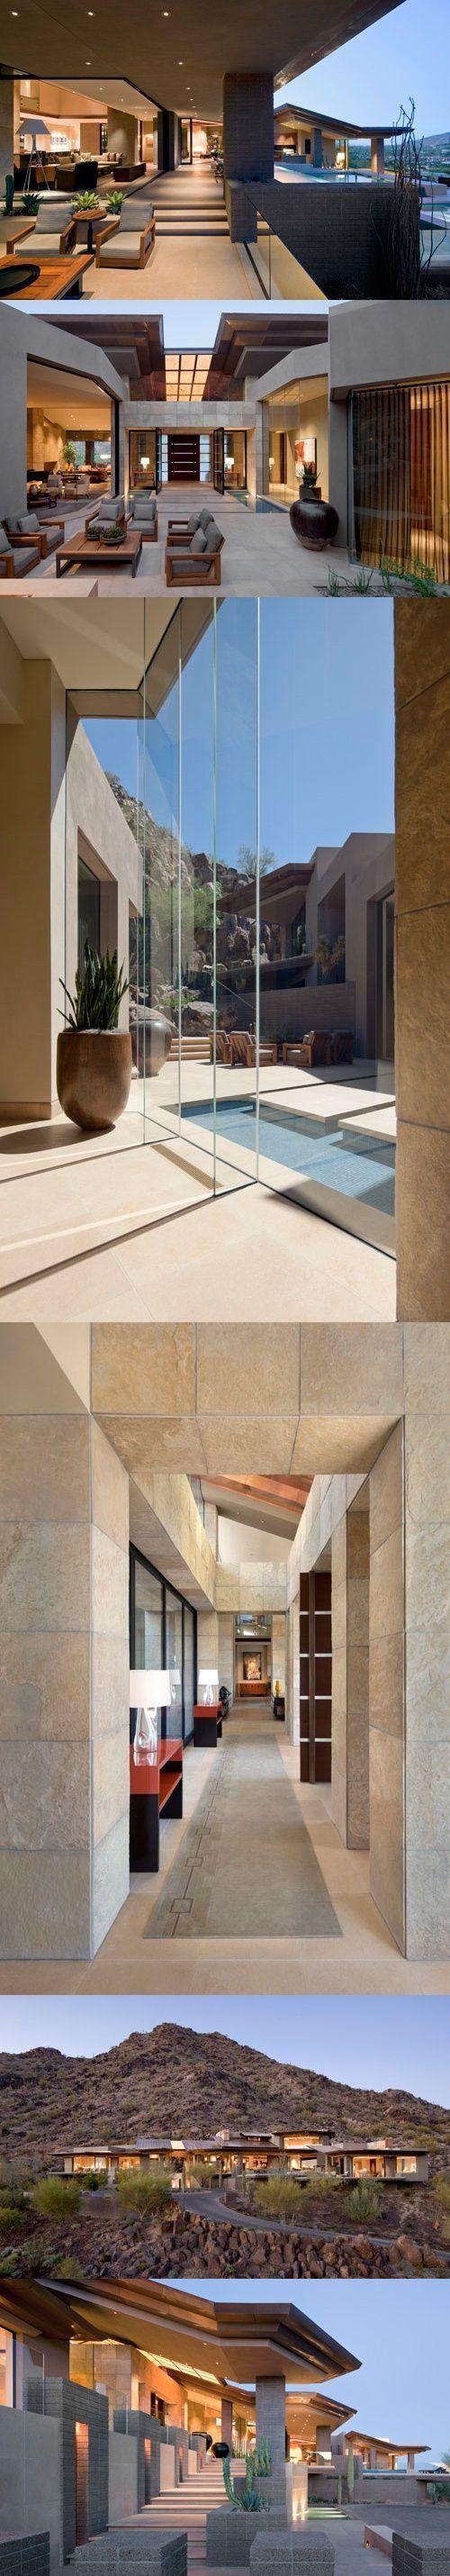 Rosamaria G Frangini | Architecture Houses |